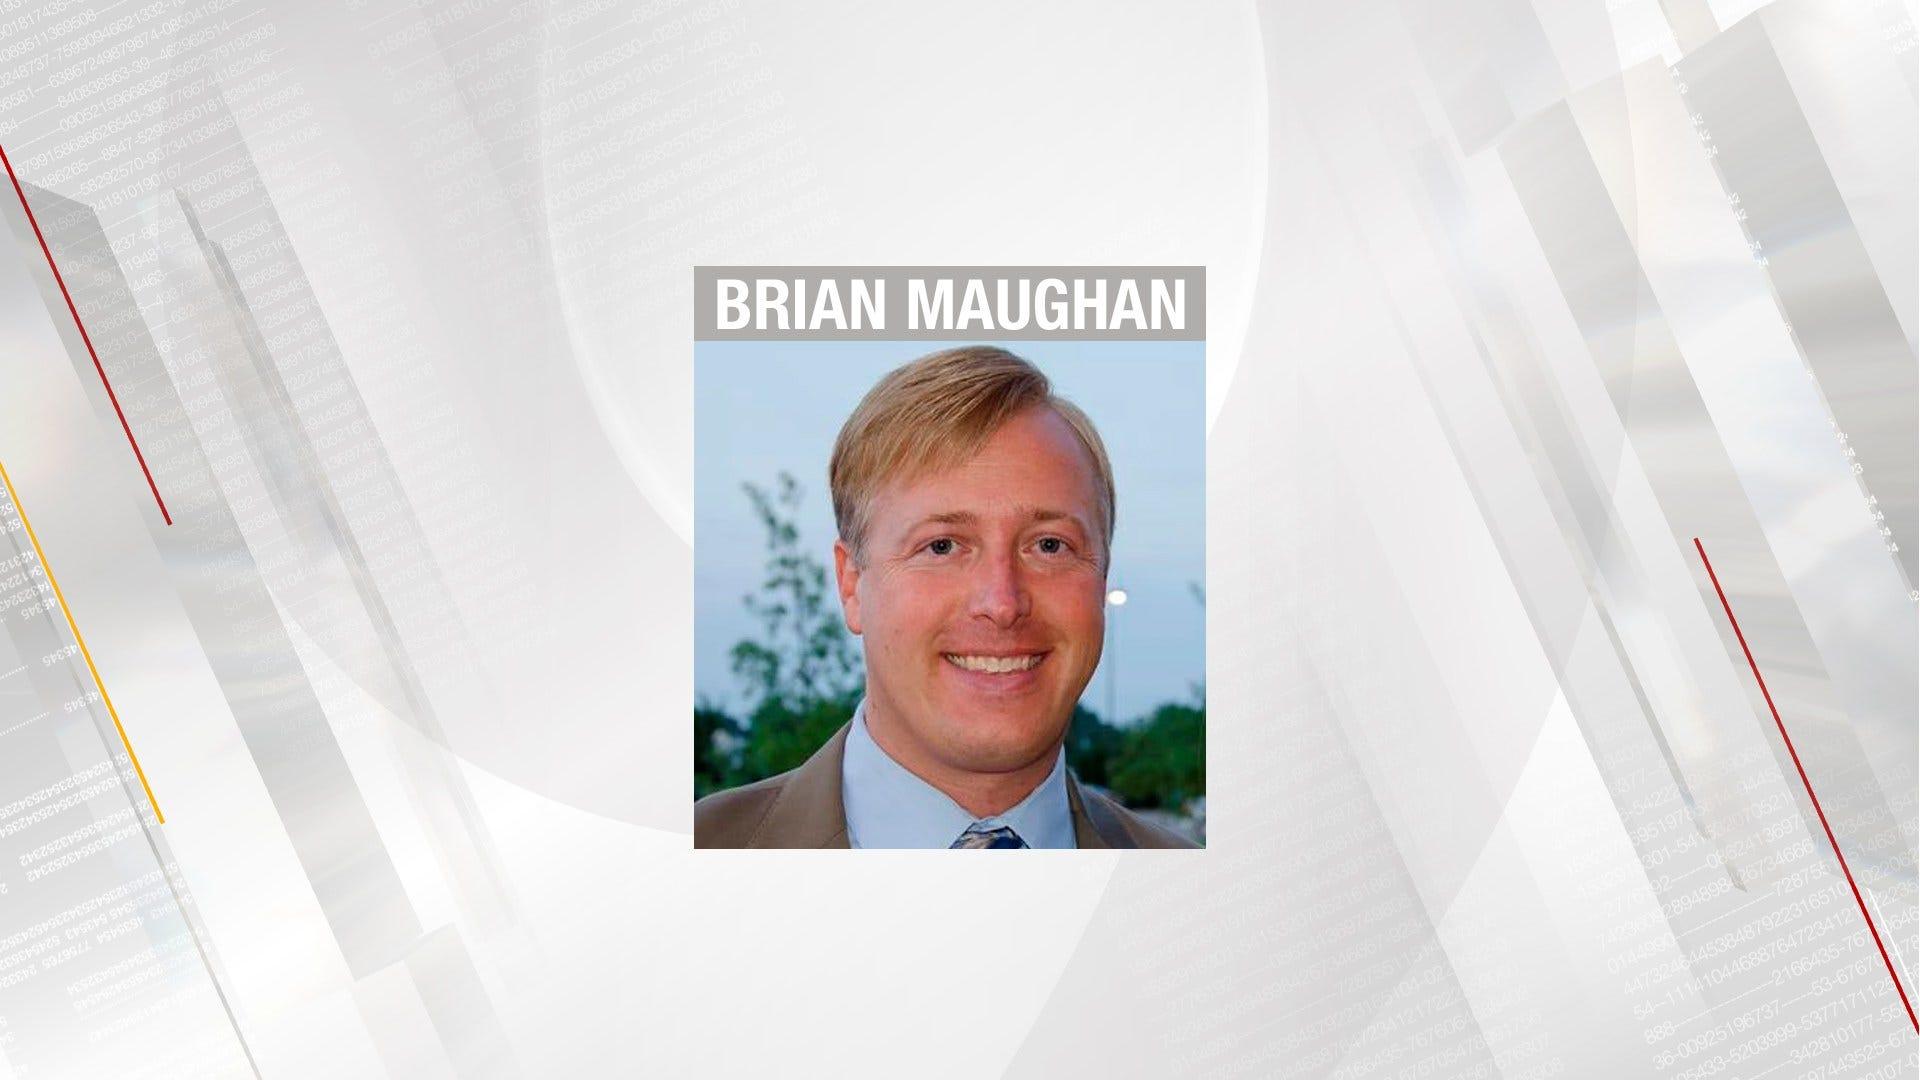 OKC Mayoral Candidate Maughan Hospitalized After Crash